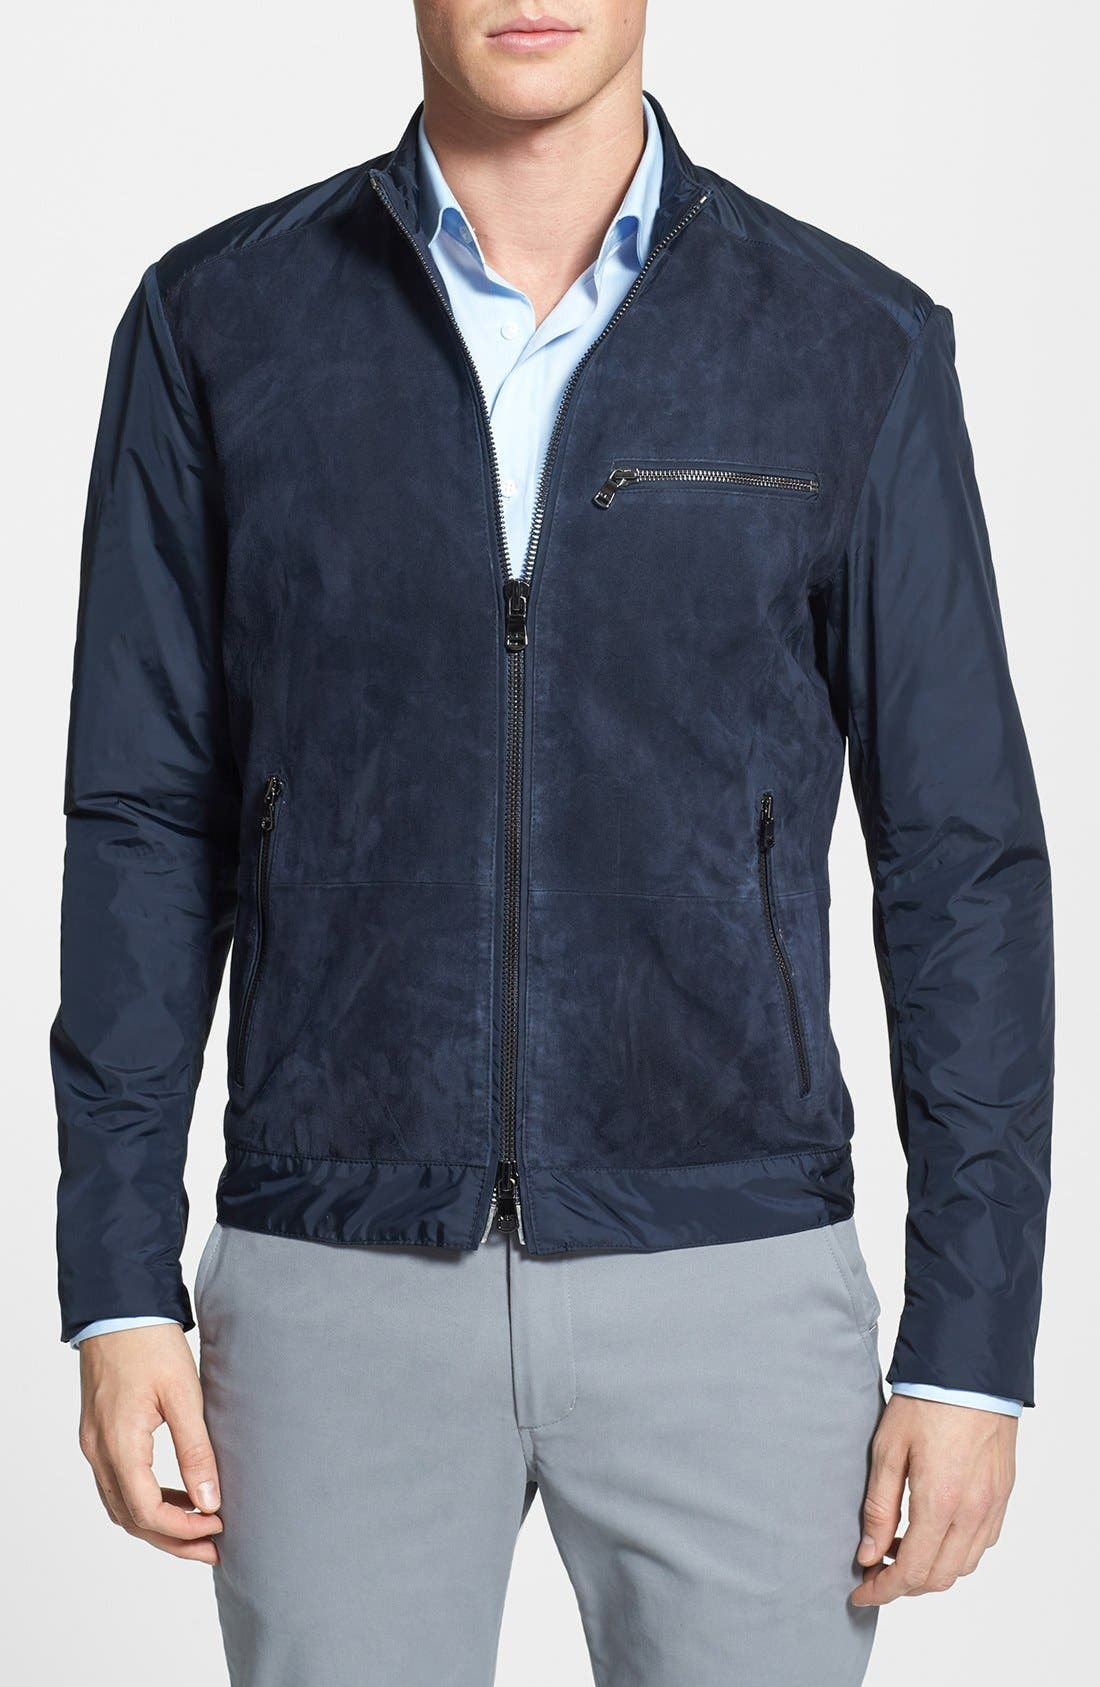 Main Image - Michael Kors Mixed Media Jacket